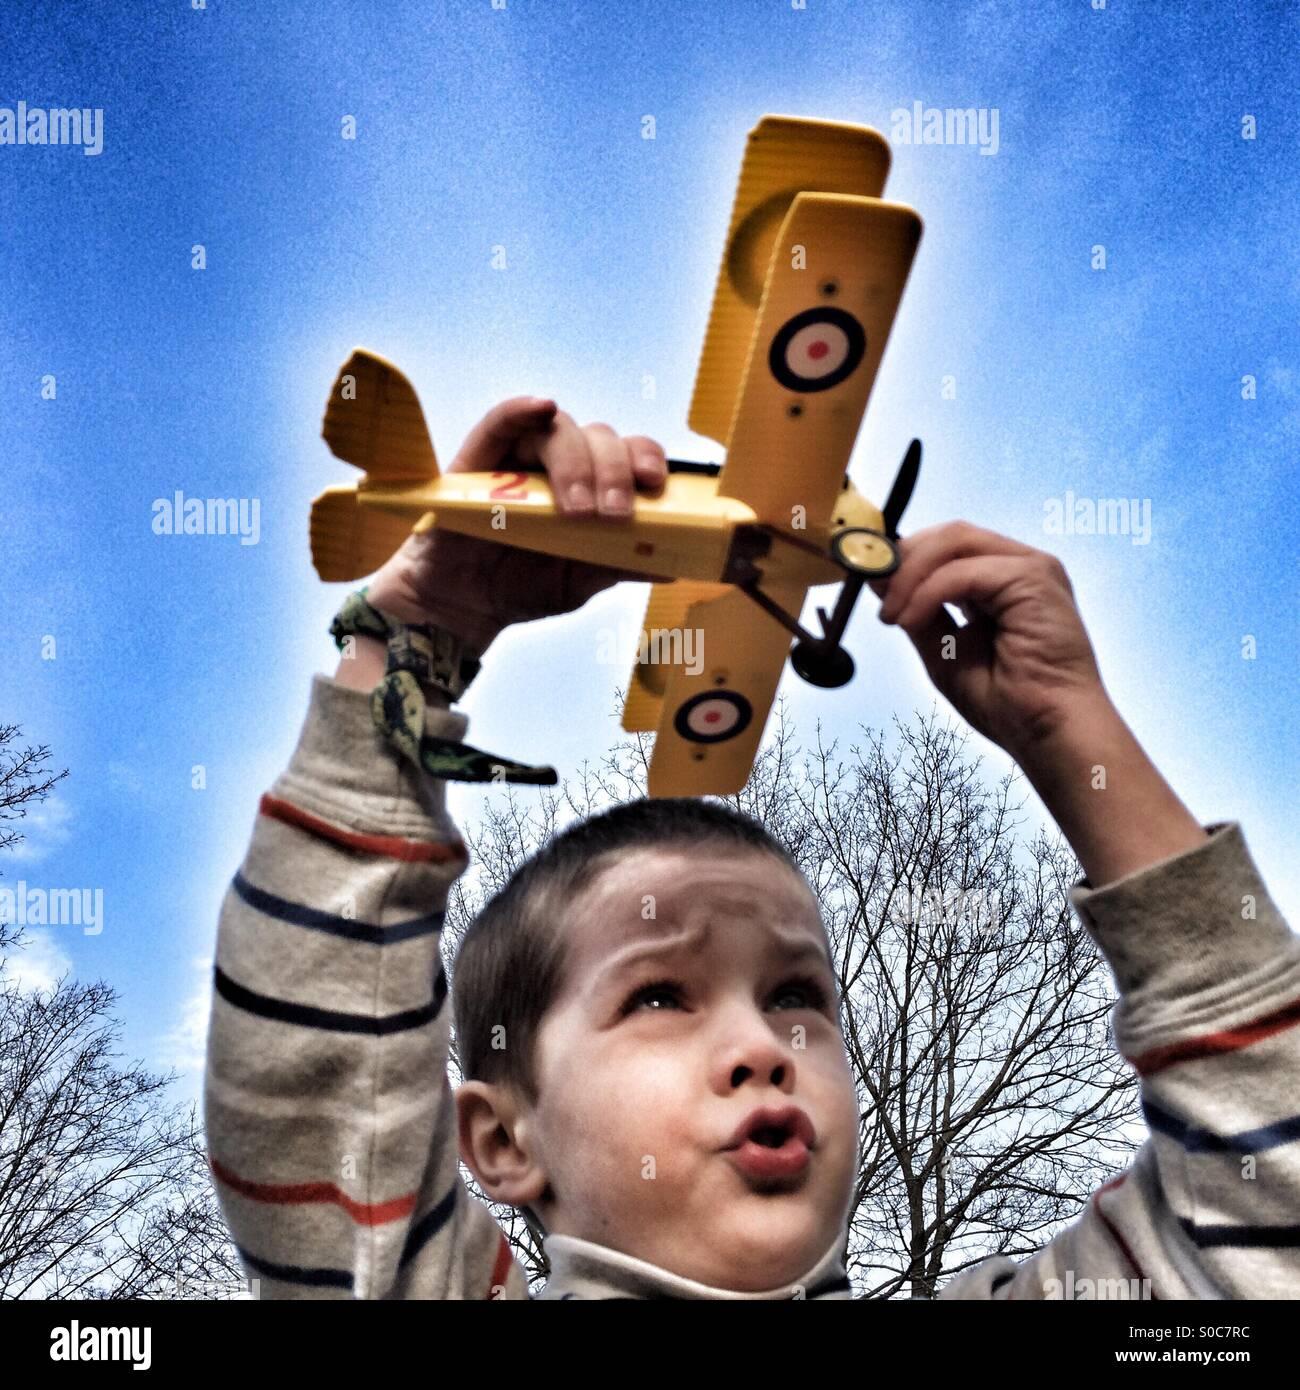 Jeune garçon jouet volant un biplan Photo Stock